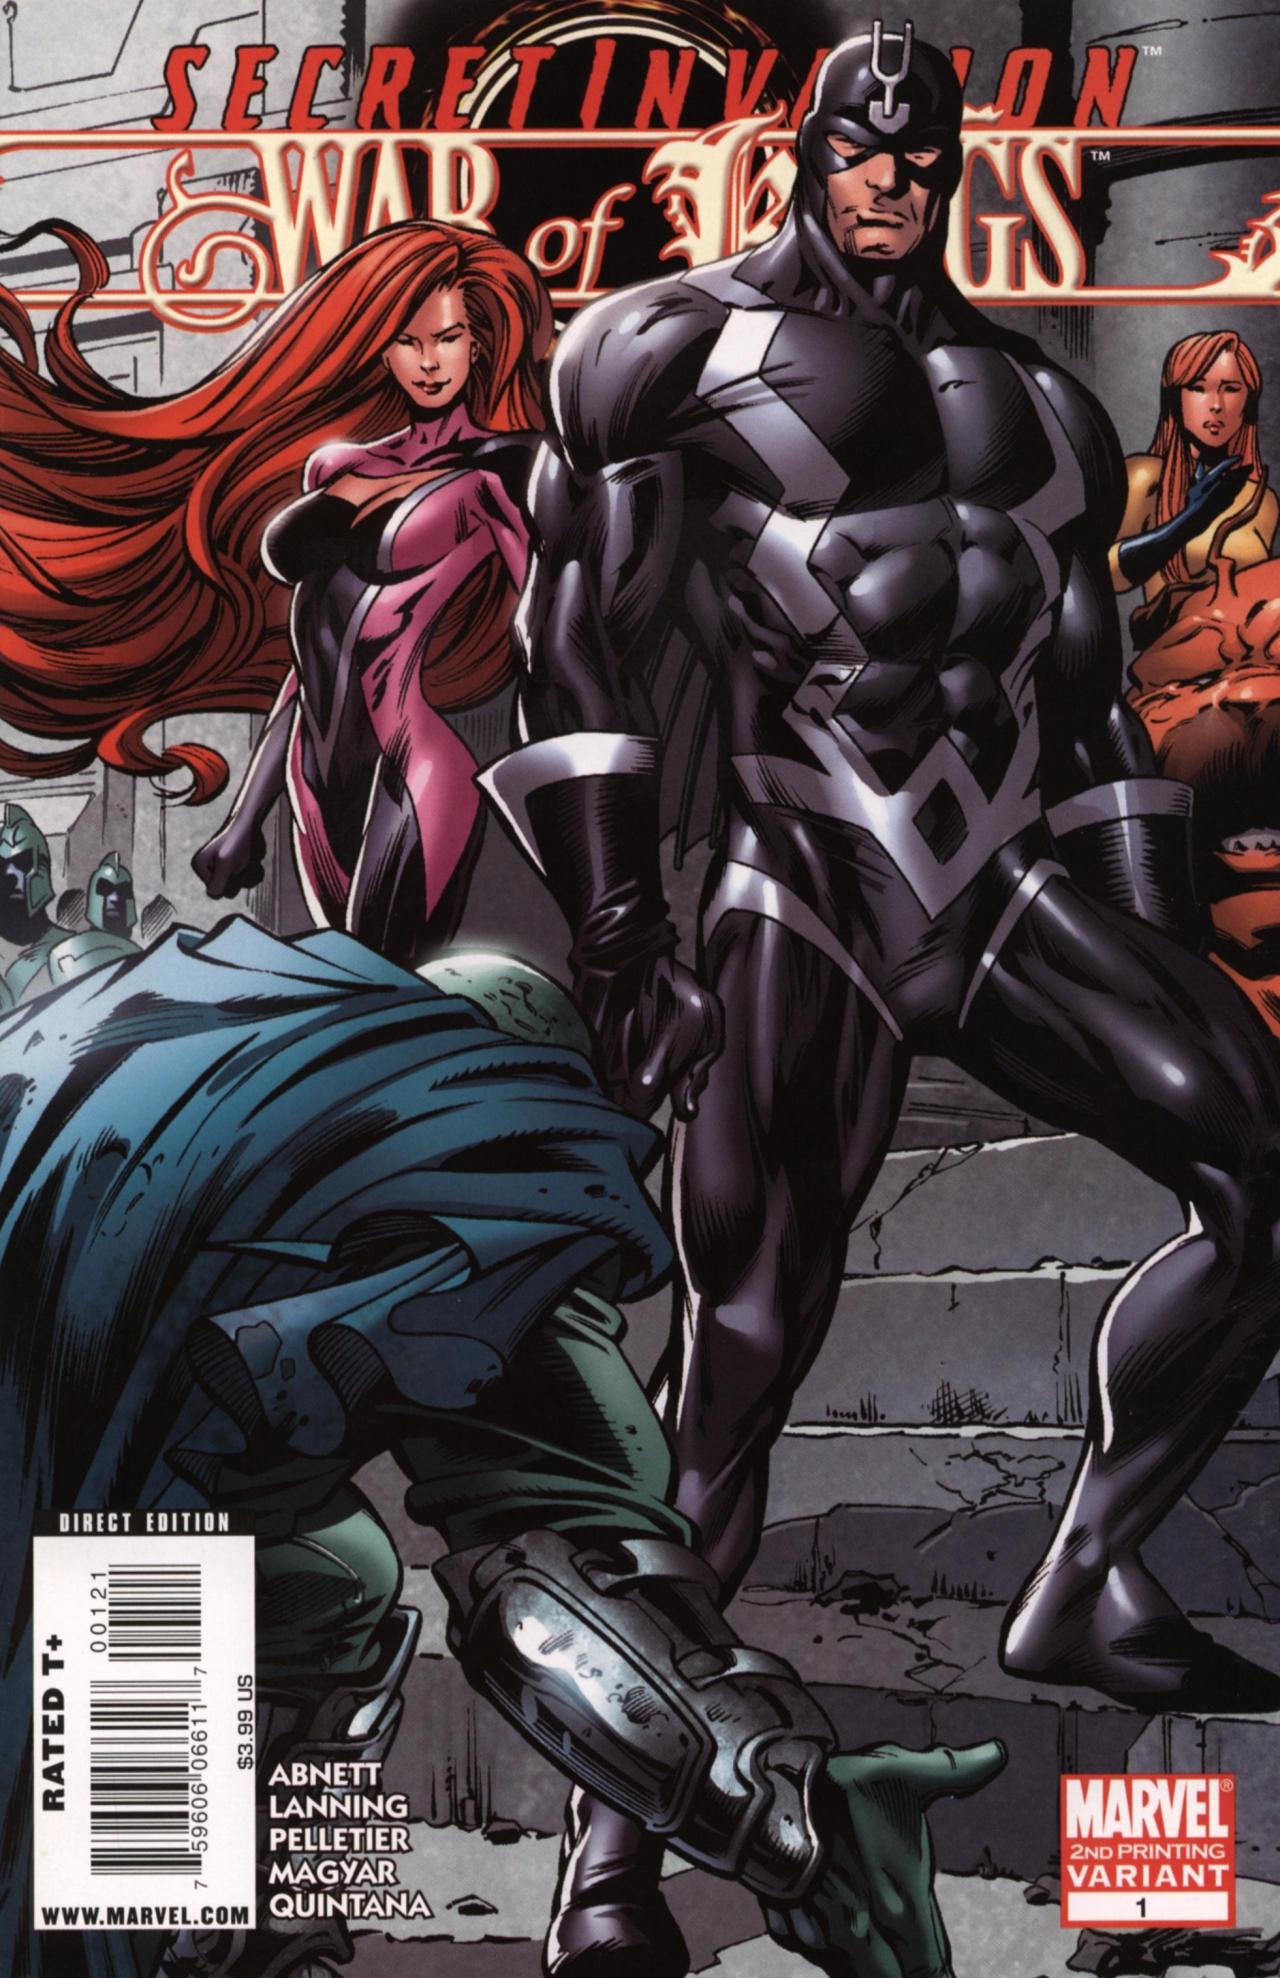 Read online Secret Invasion: War of Kings comic -  Issue # Full - 2